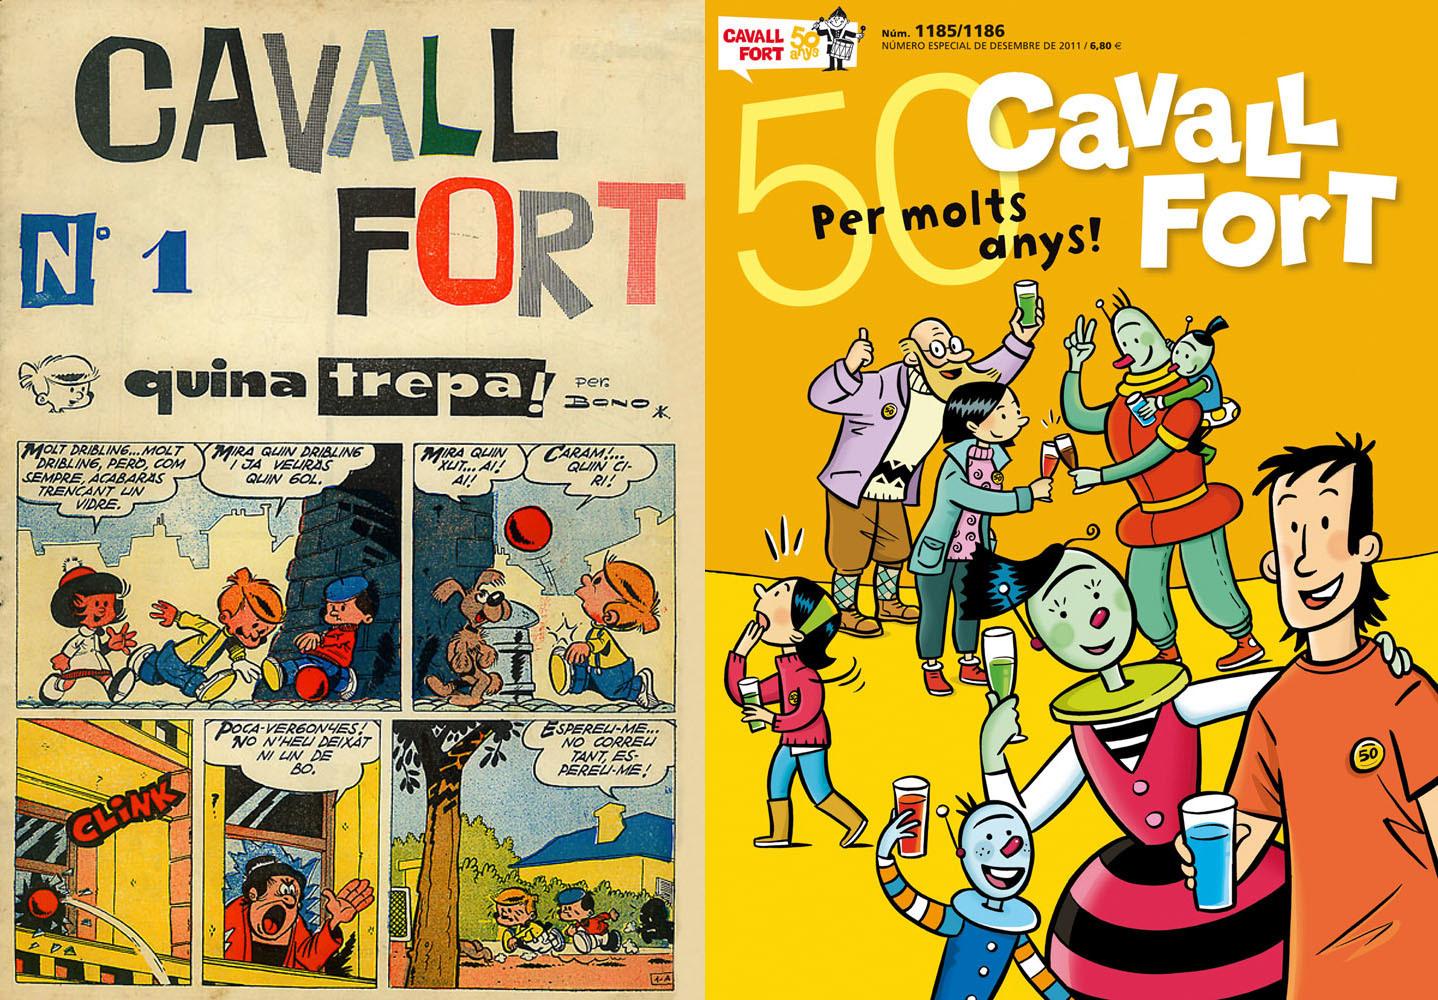 Cavall Fort